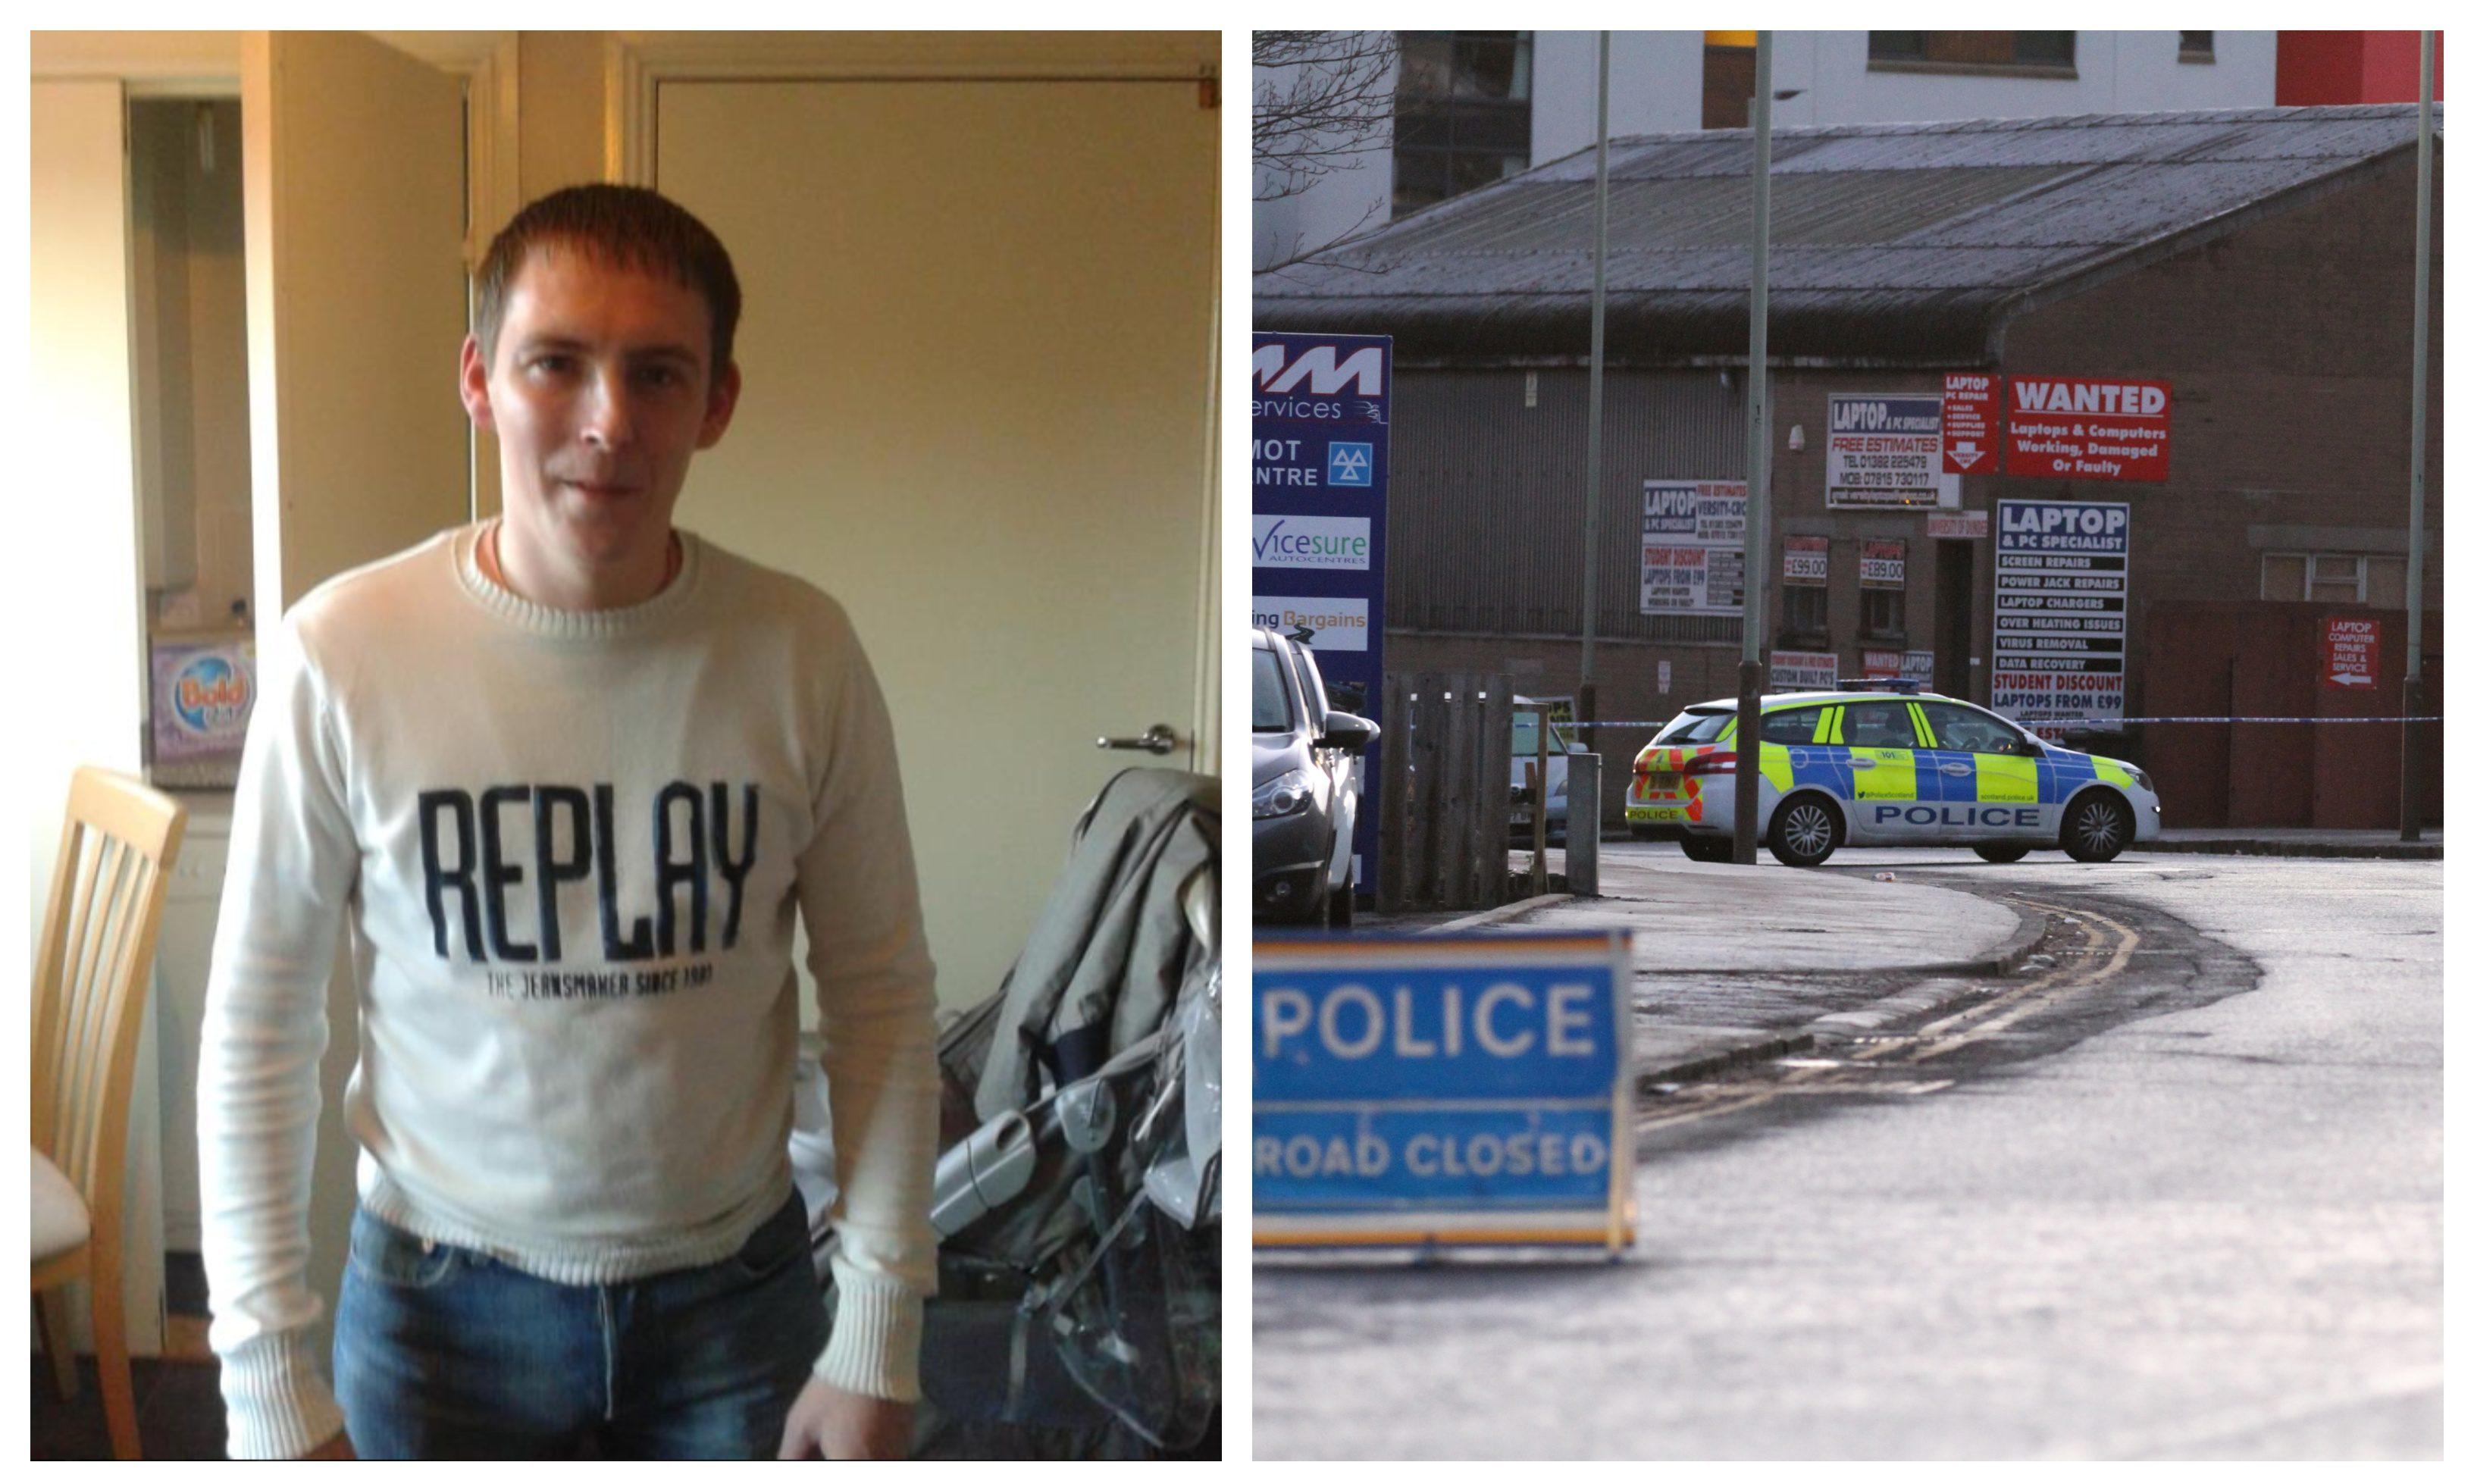 Rapist Mark Arnott and police at the scene last year